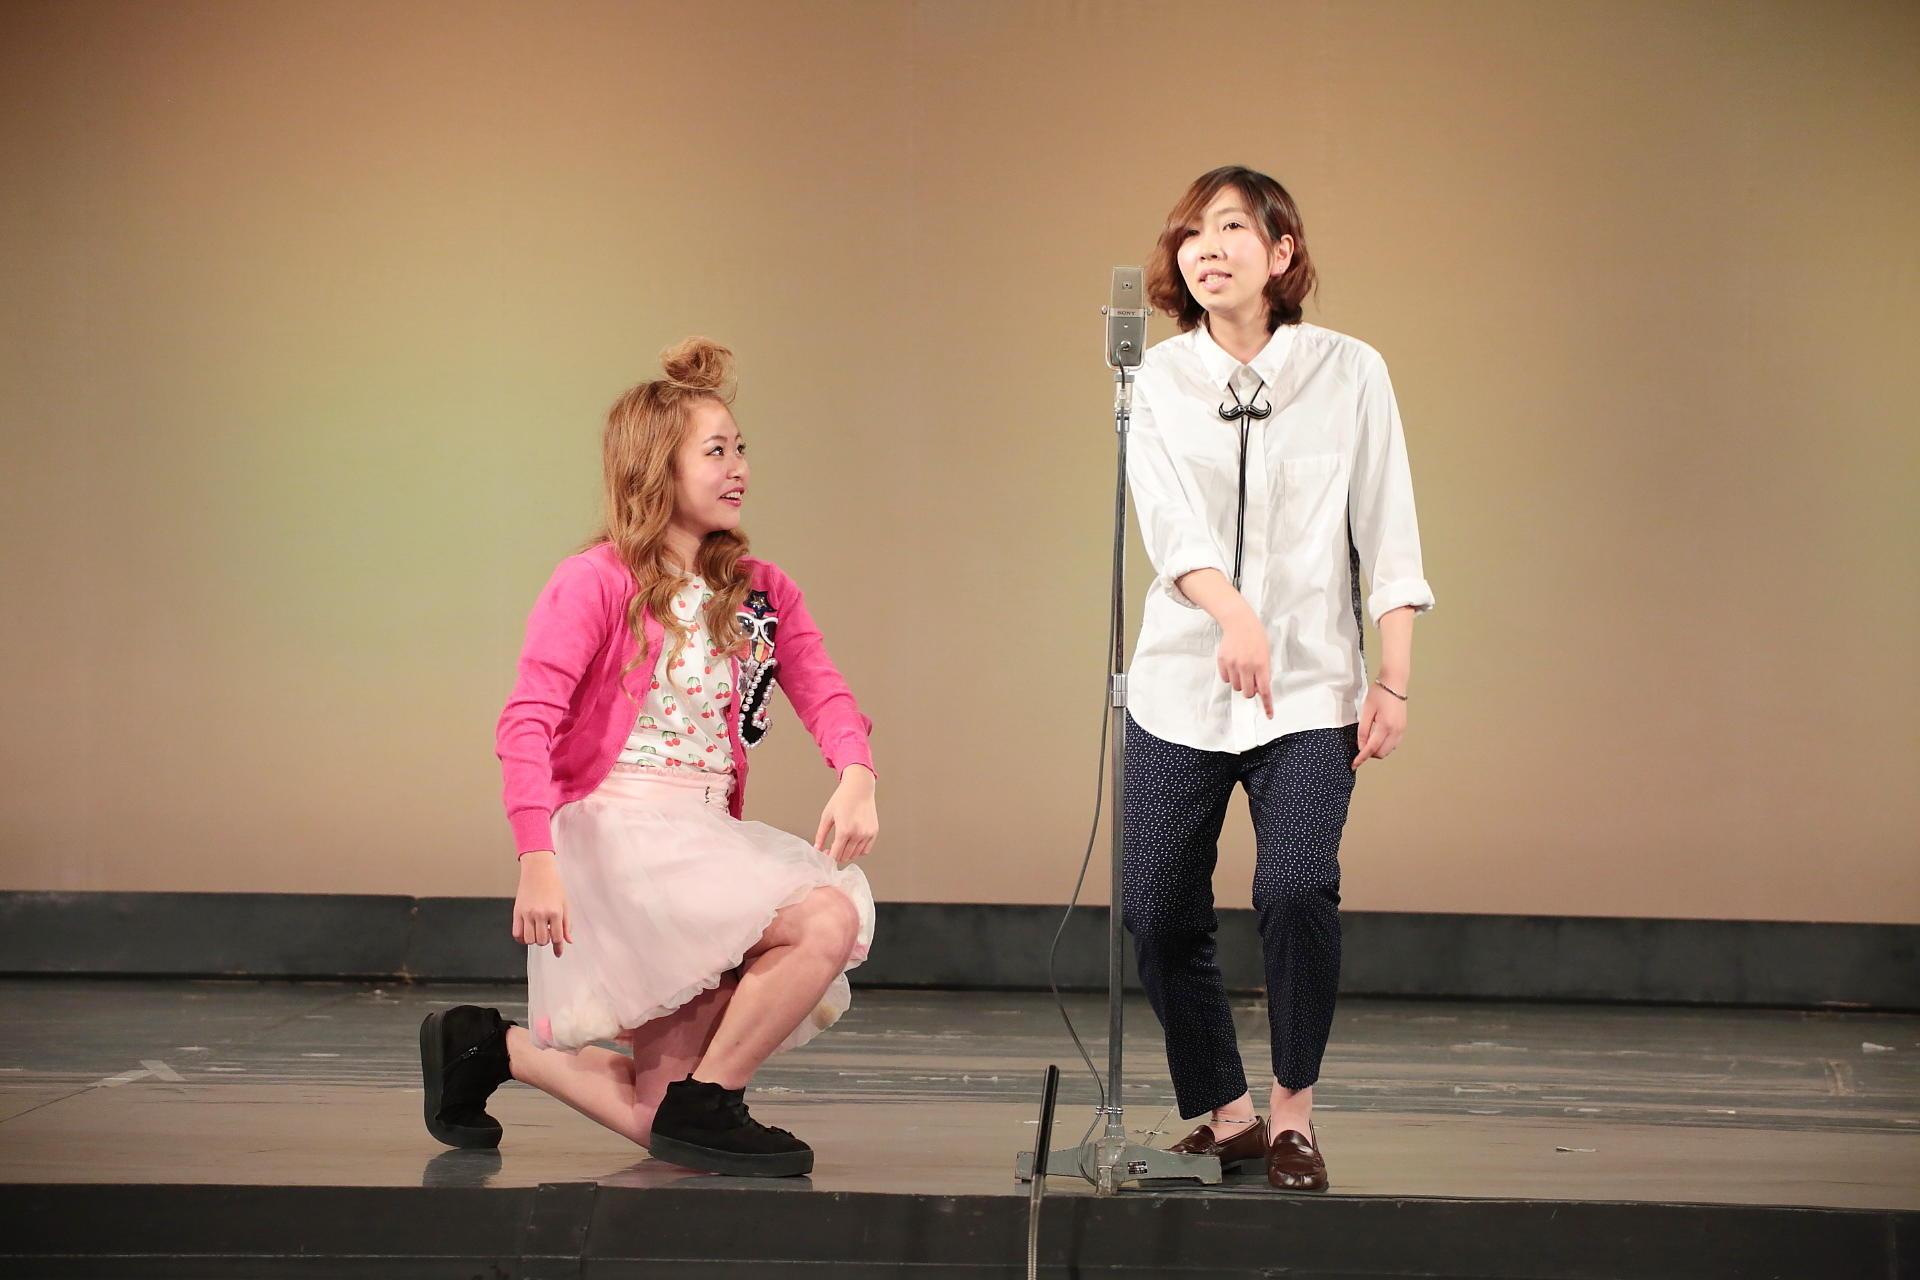 http://news.yoshimoto.co.jp/20171223170807-331950b5b17295395438f32a1e79dd1d581d8db5.jpg